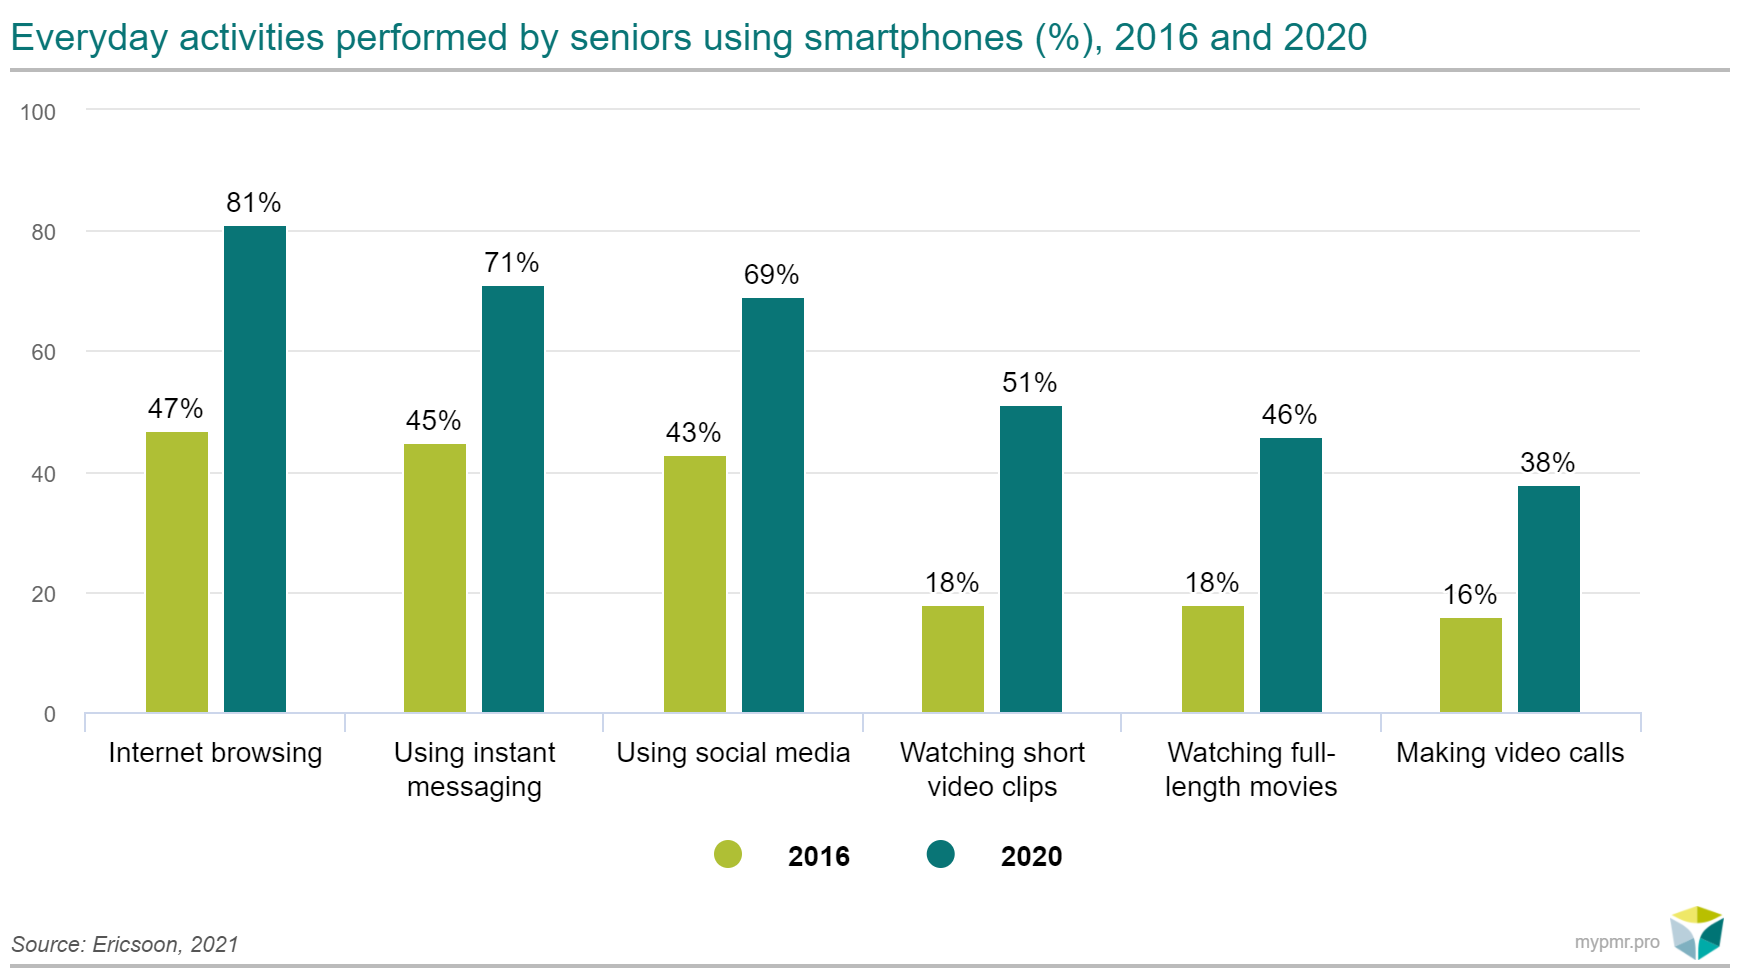 Ericsson badanie - seniorzy